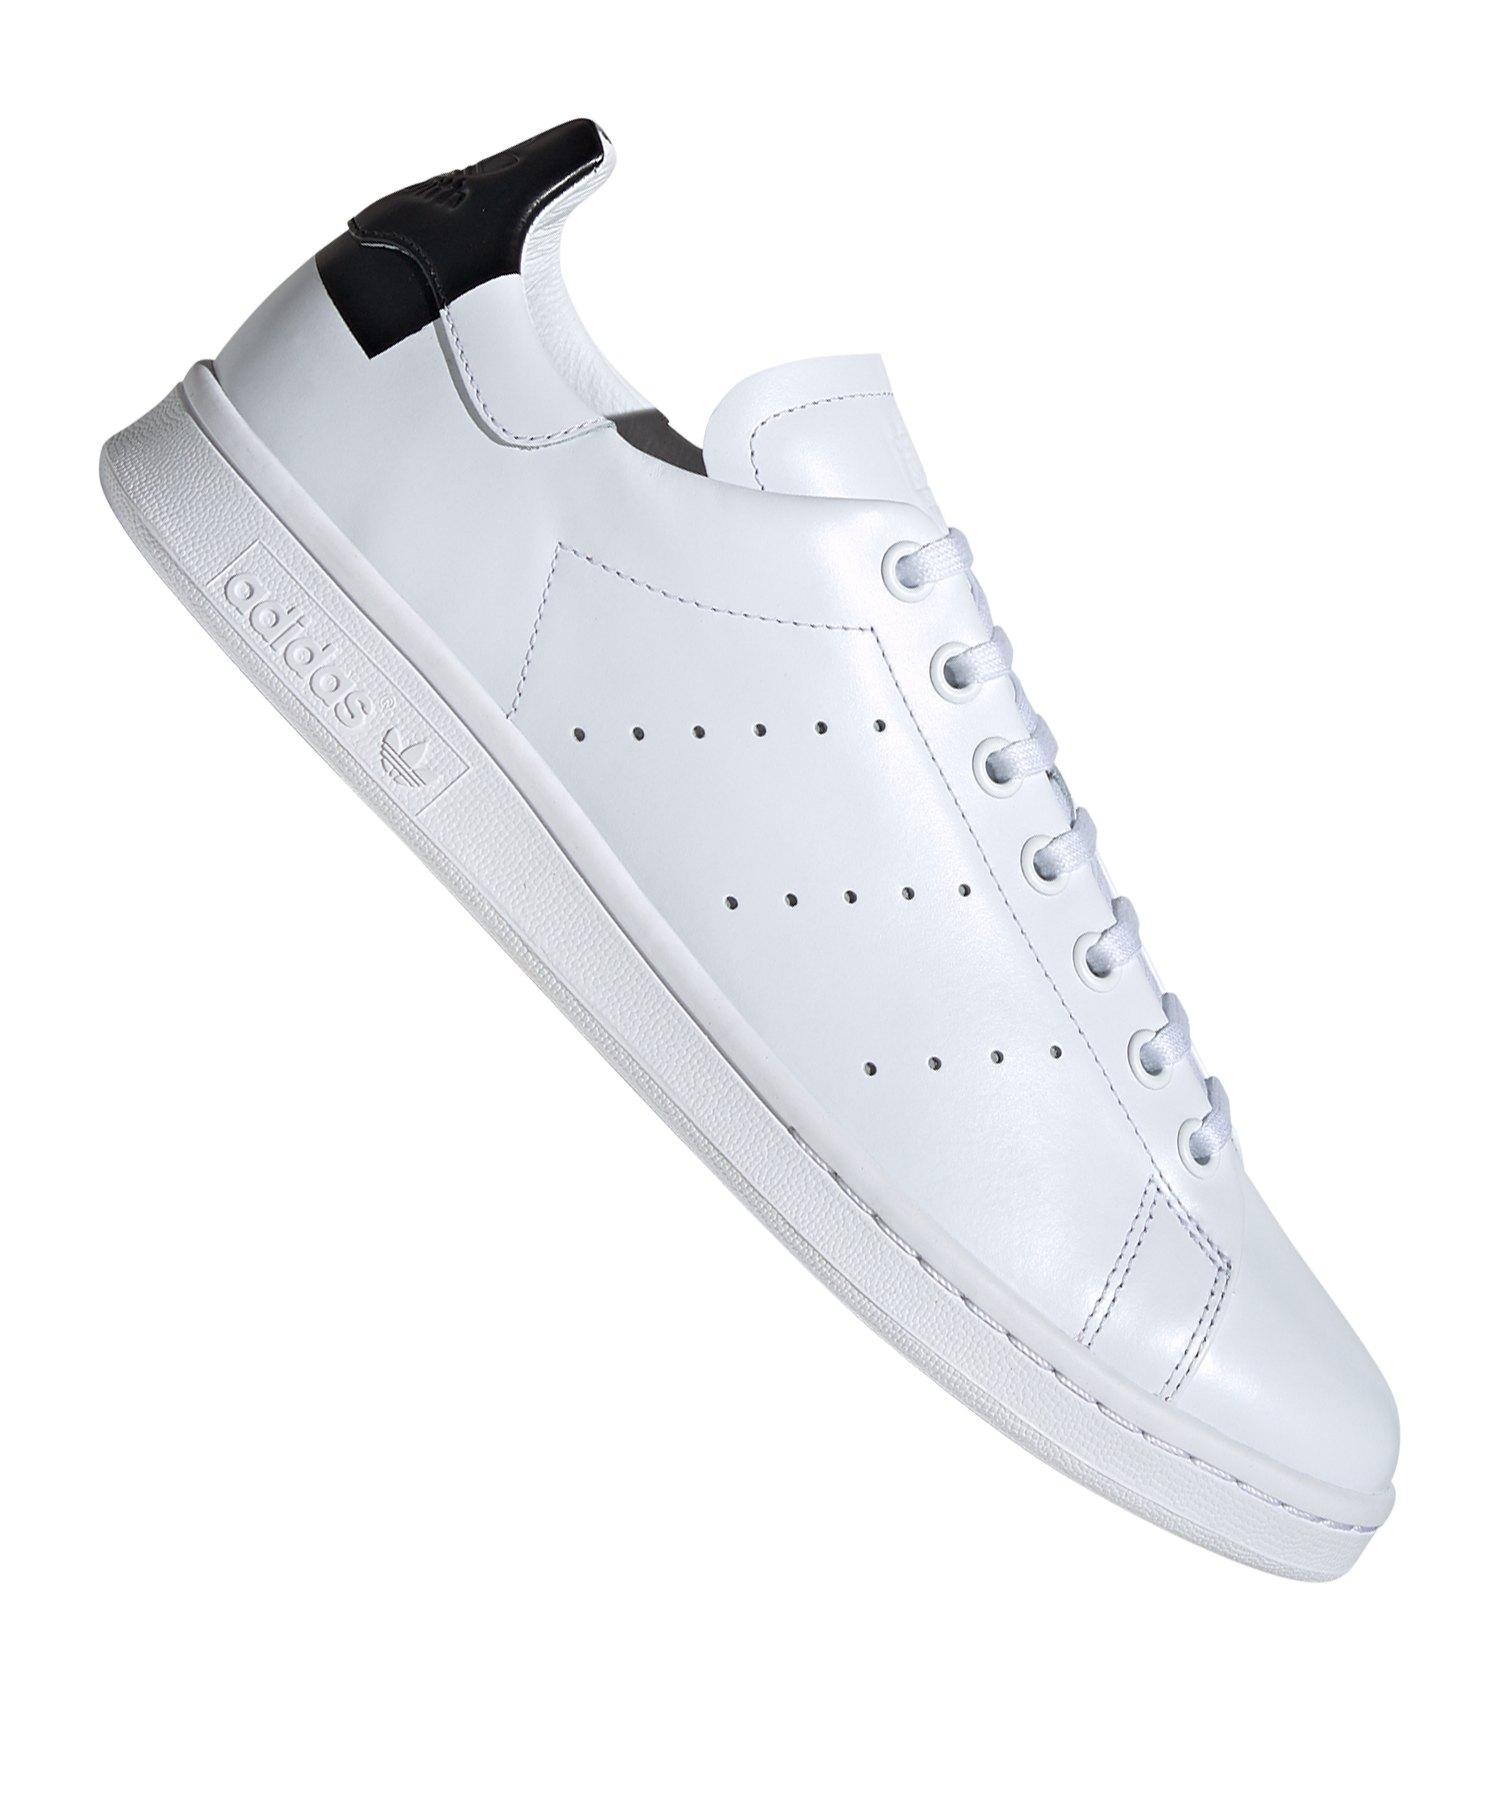 Herren Adidas Sneaker   Adidas Stan Smith Schuhe weiß   LAKABA